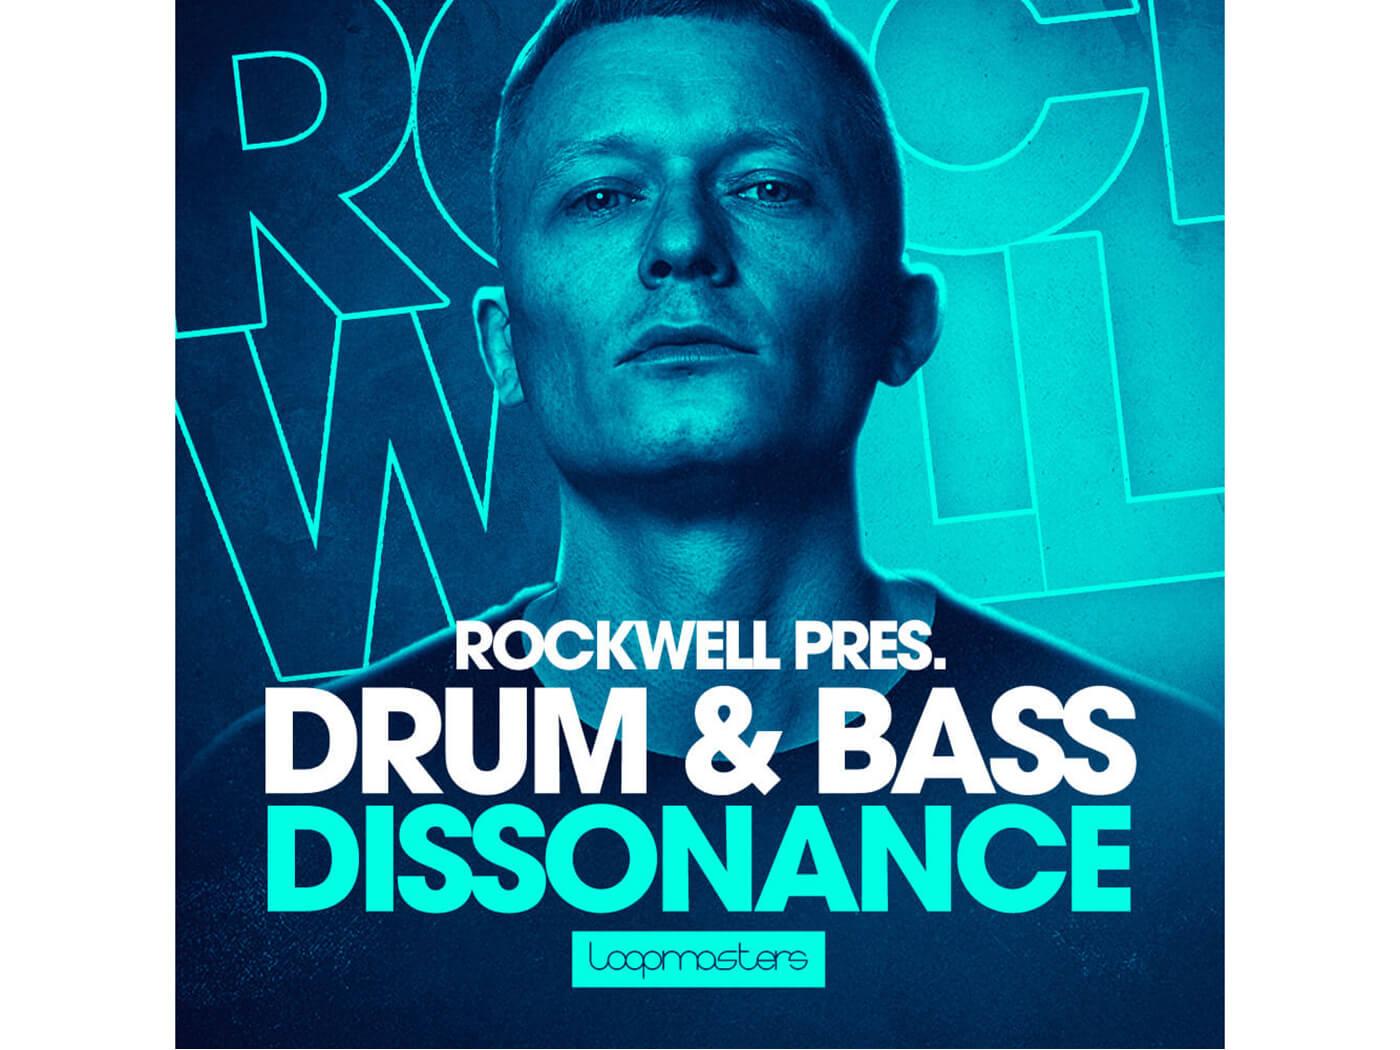 Loopmasters - Rockwell Drum & Bass Dissonance